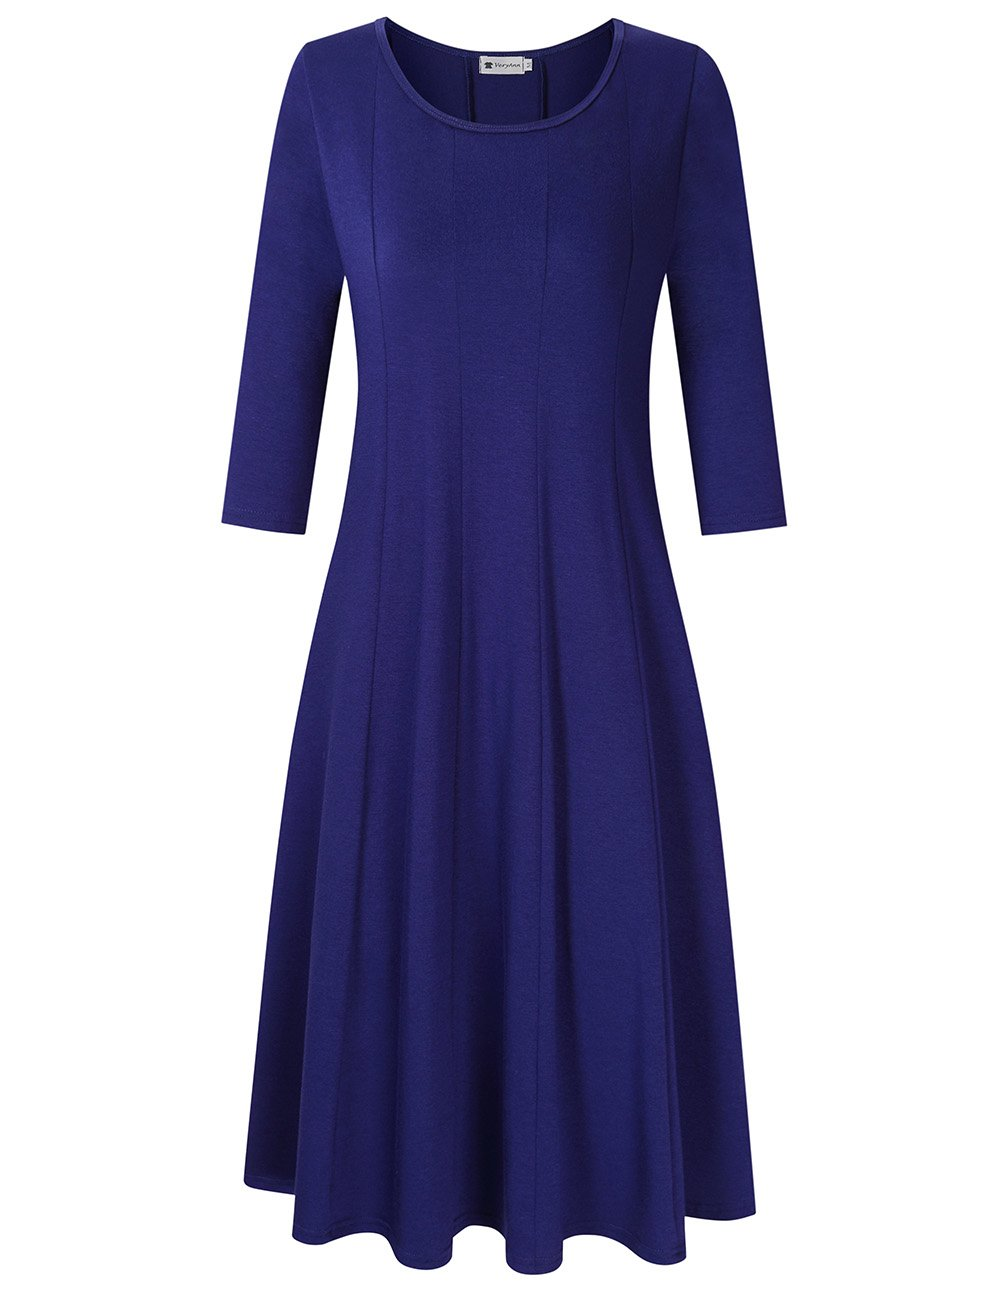 Women's 3/4 Sleeve A-Line Long Midi Dress Blue M